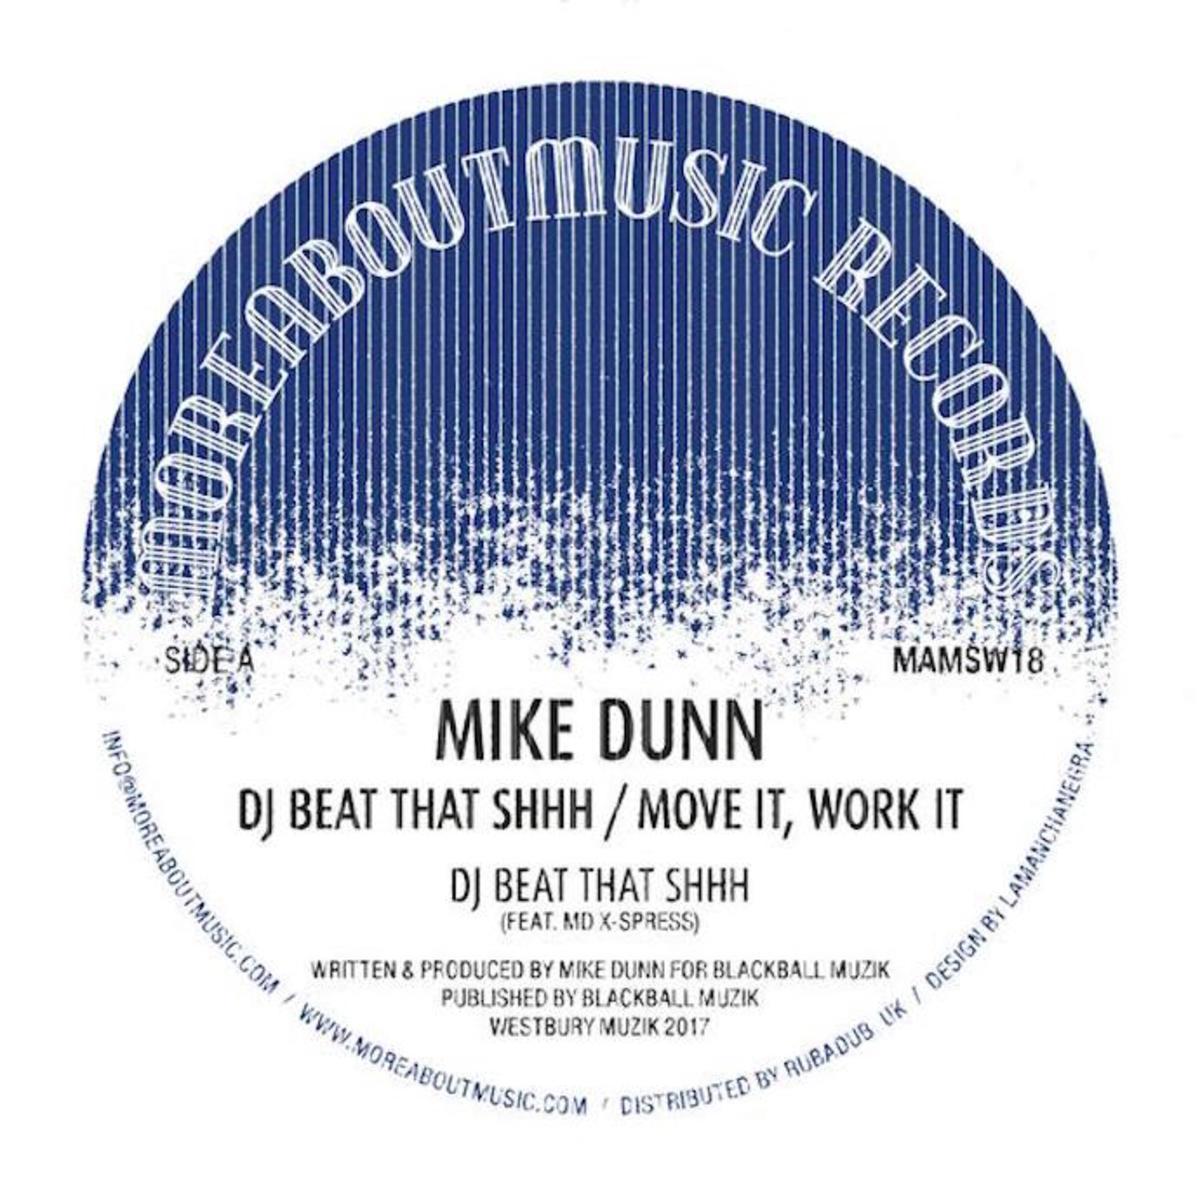 MikeDunn